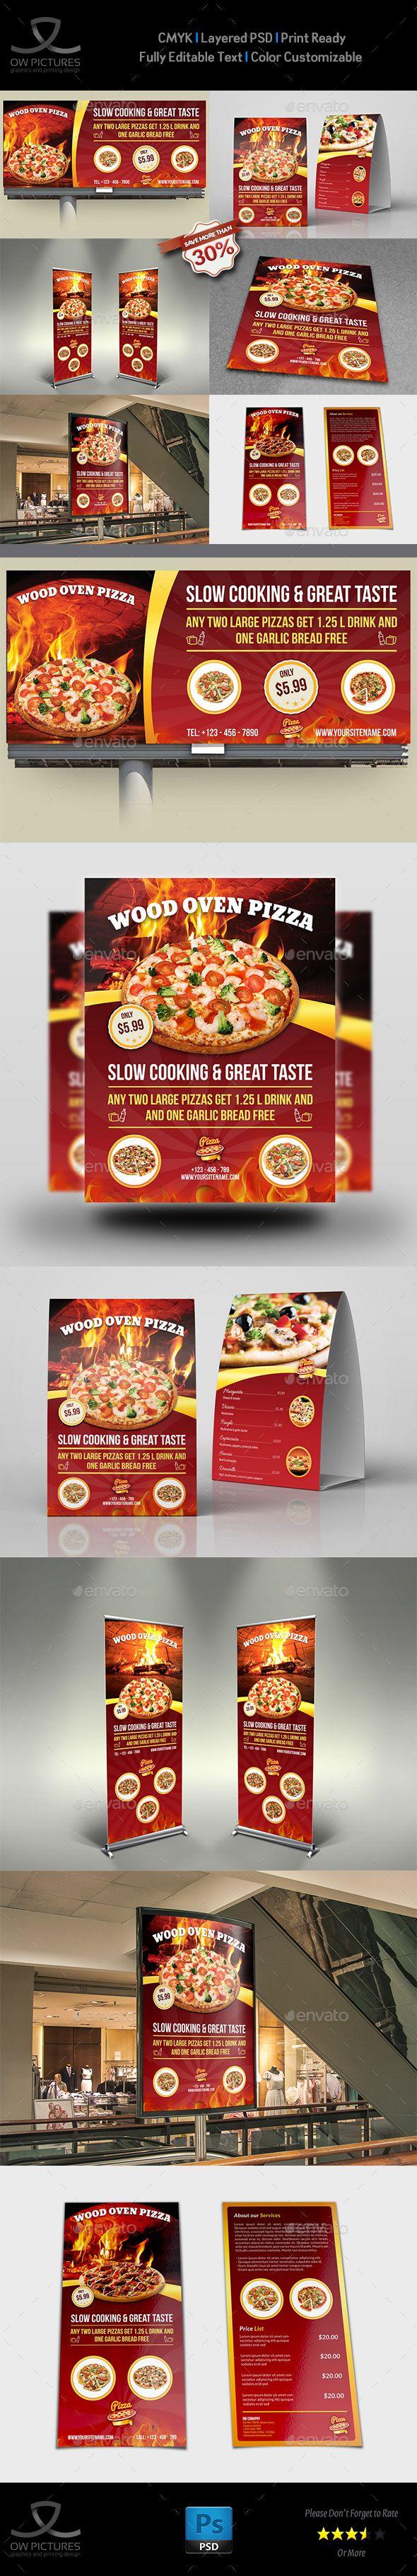 Pizza Restaurant Advertising Bundle Vol.2 by OWPictures Advertising Bundle Descr...